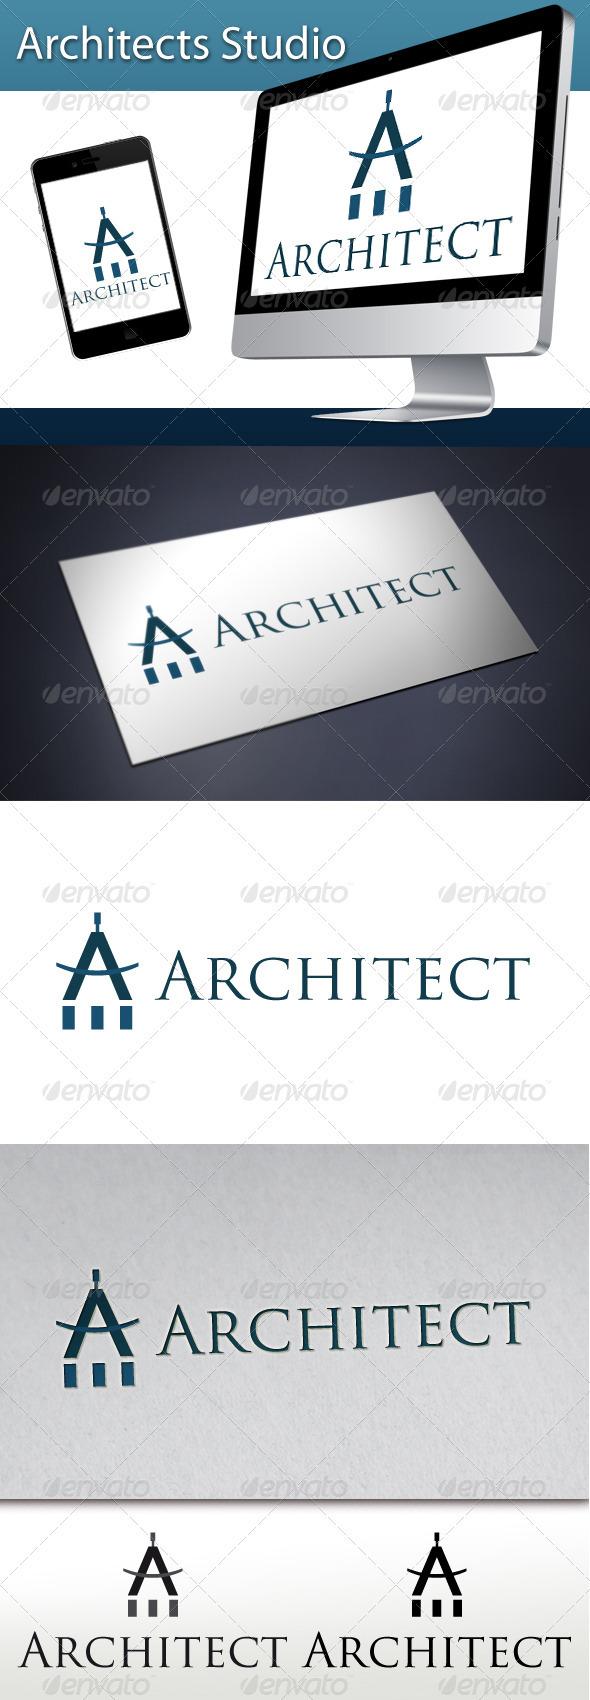 GraphicRiver Architects Studio Logo 1 3337345